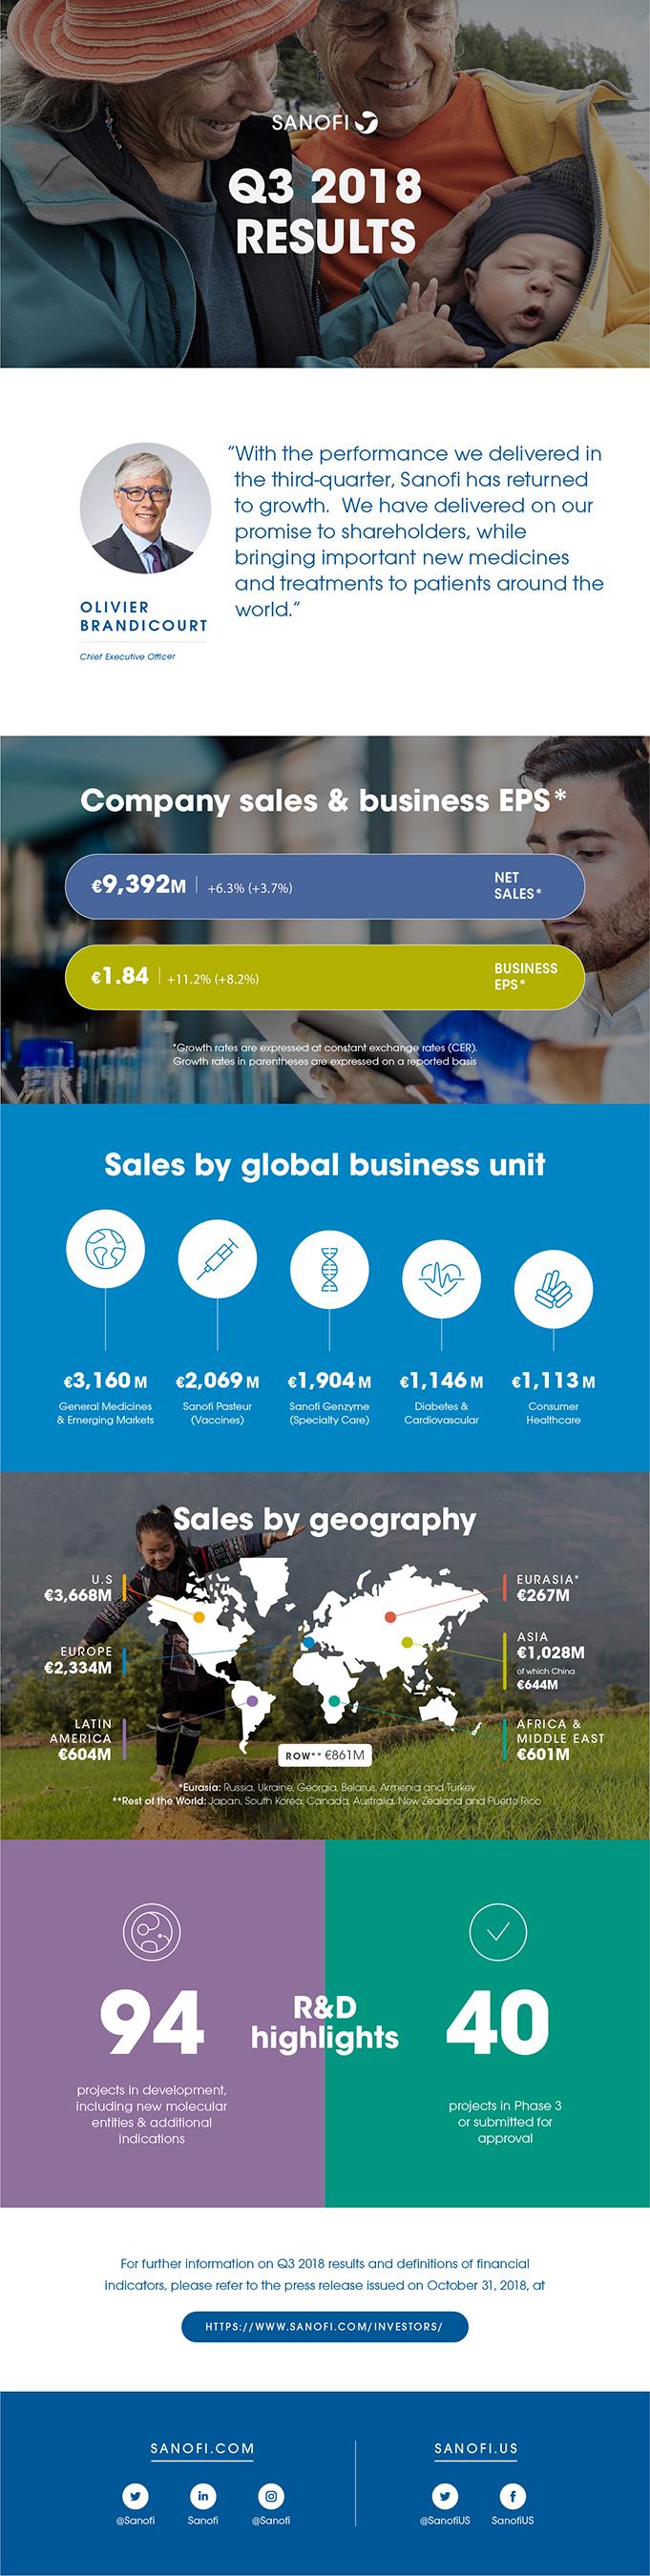 Sanofi Q3 2018 Results Infographic